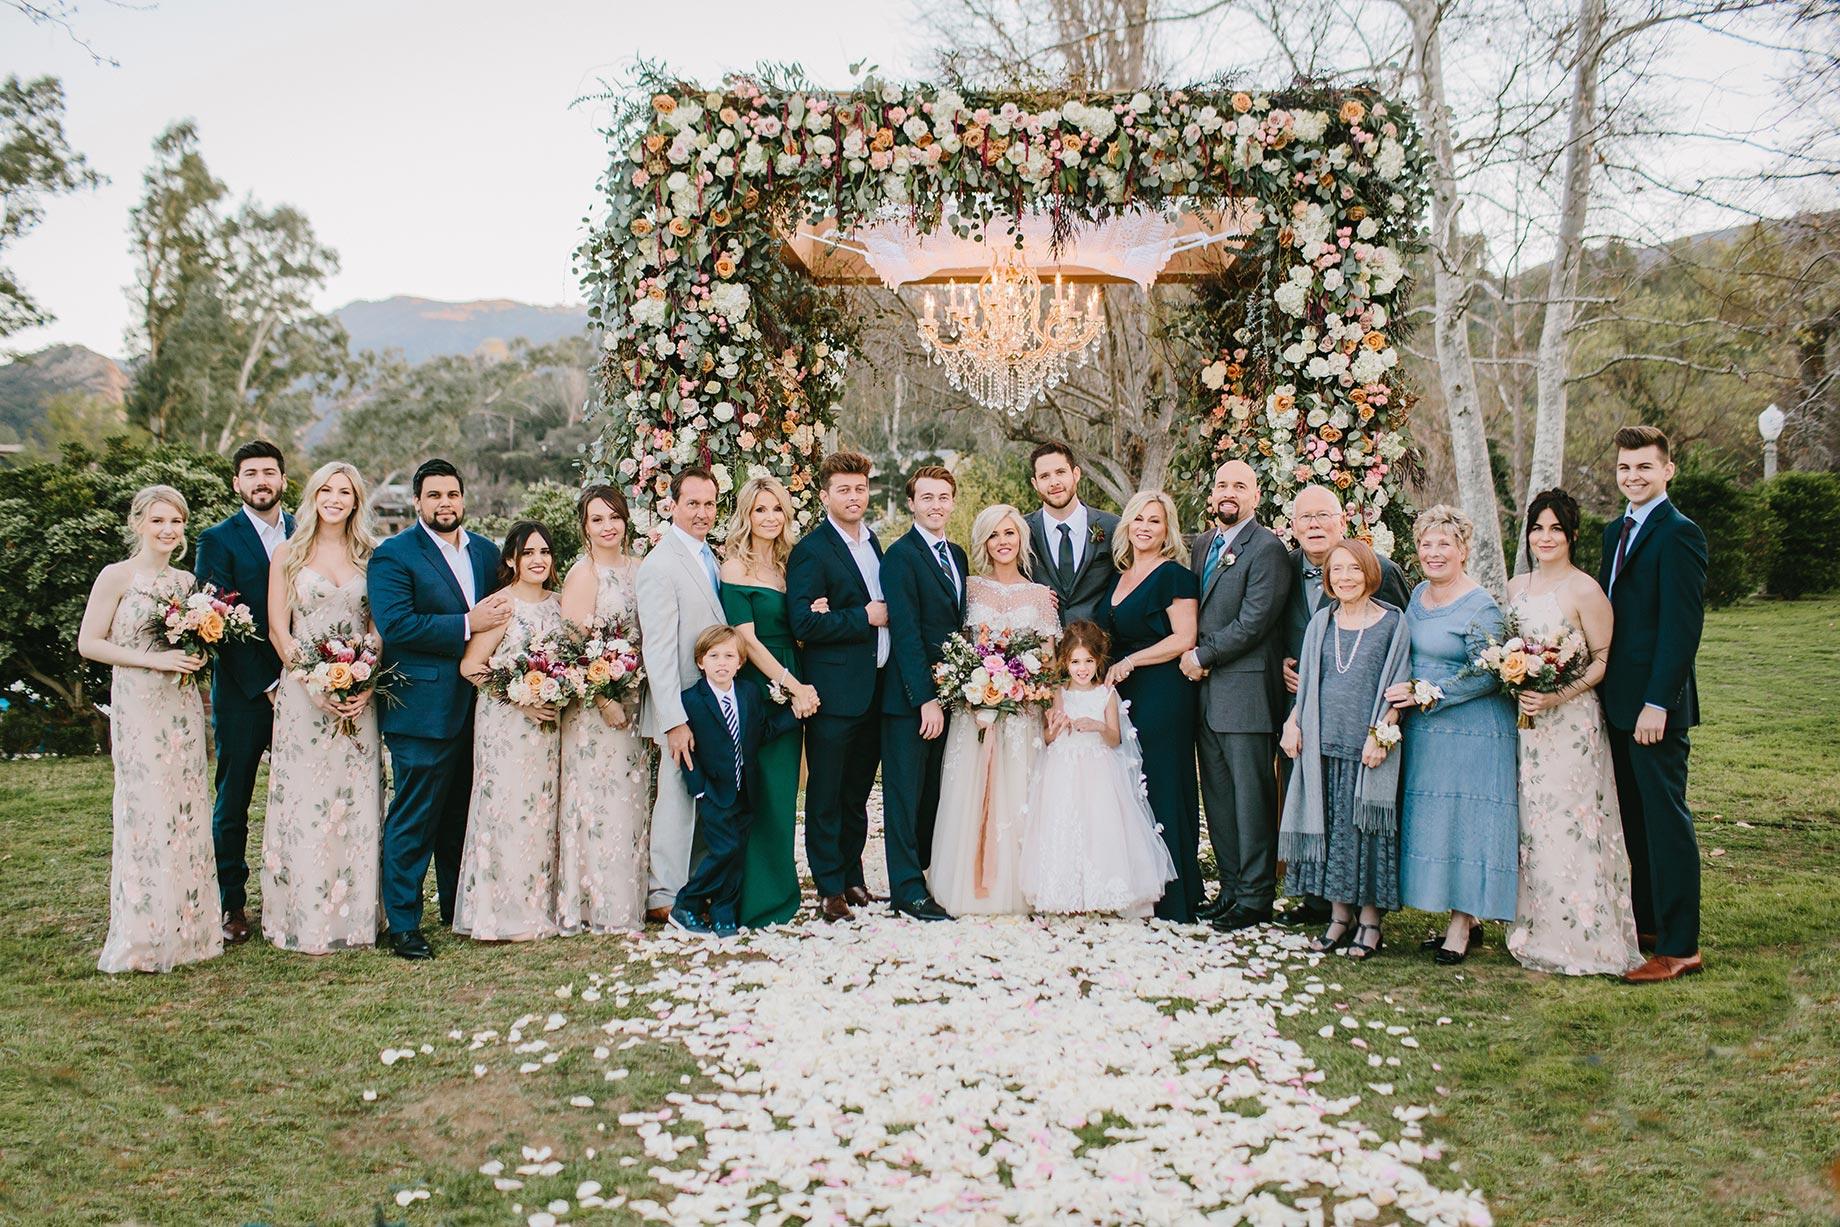 Tamiandroy-Wedding-Party-on-the-Lawn-Malibou-Lake-Lodge.jpg